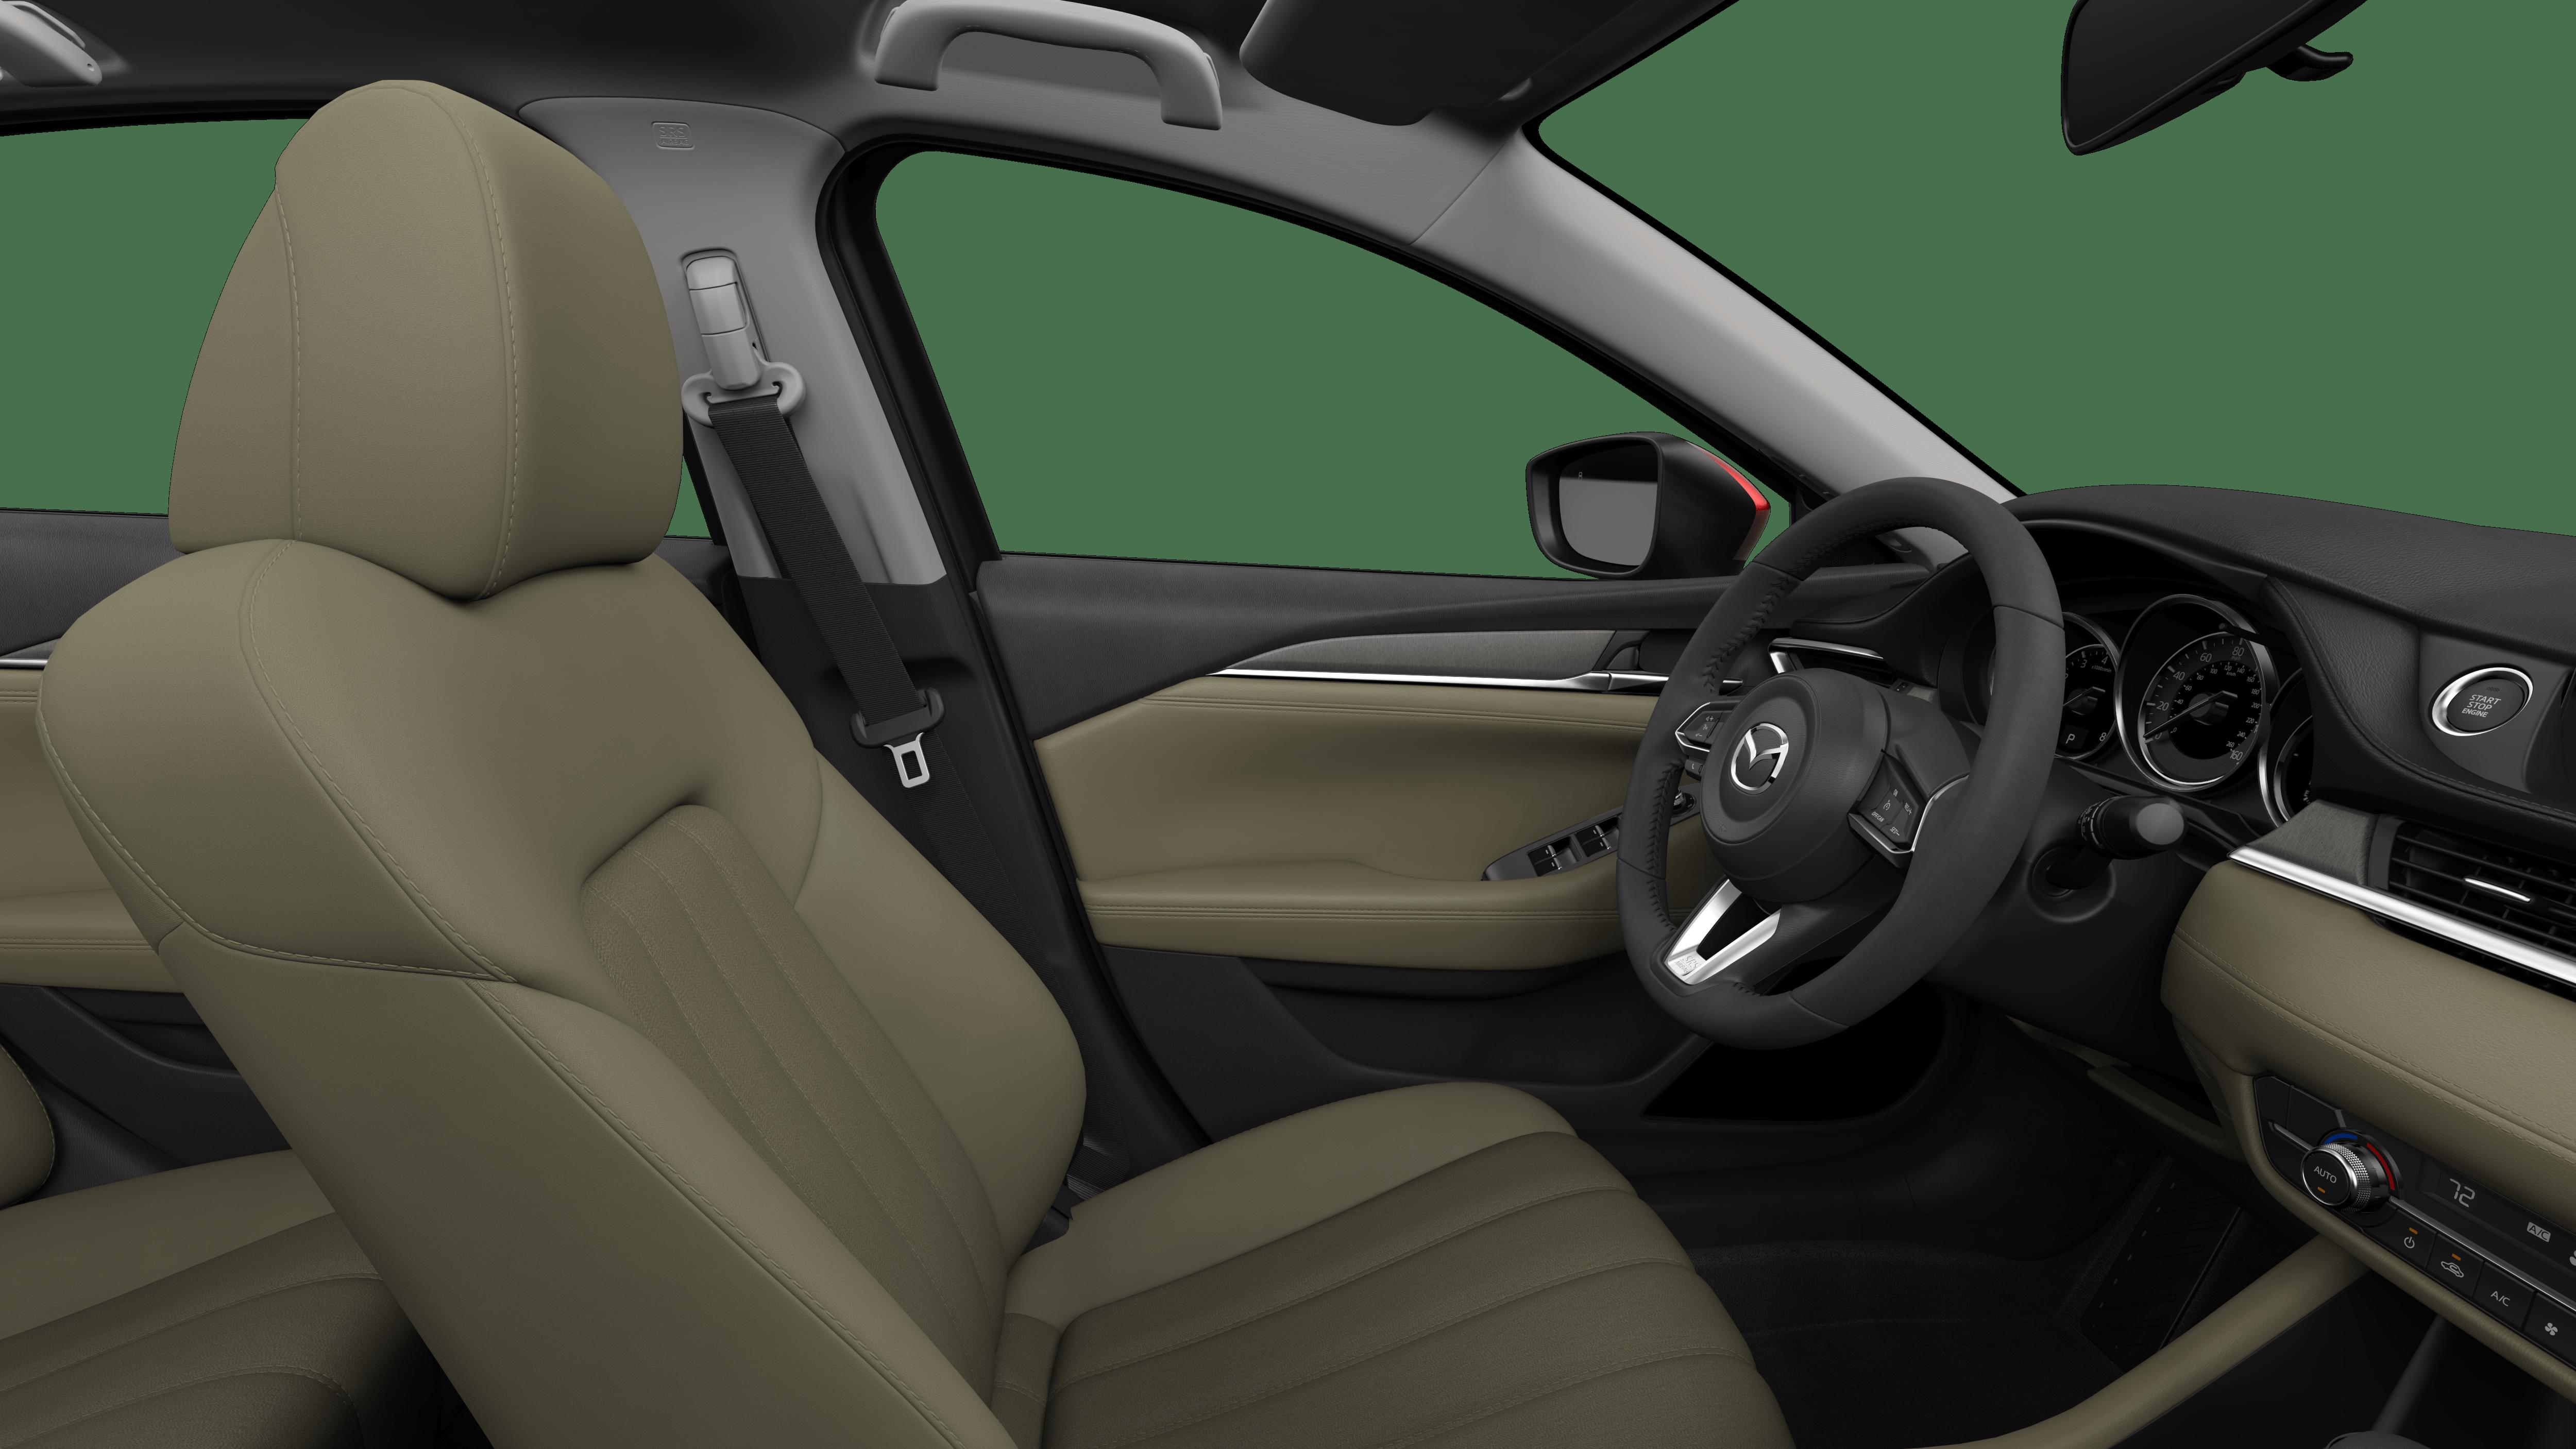 2018 Mazda6, Sand Leatherette